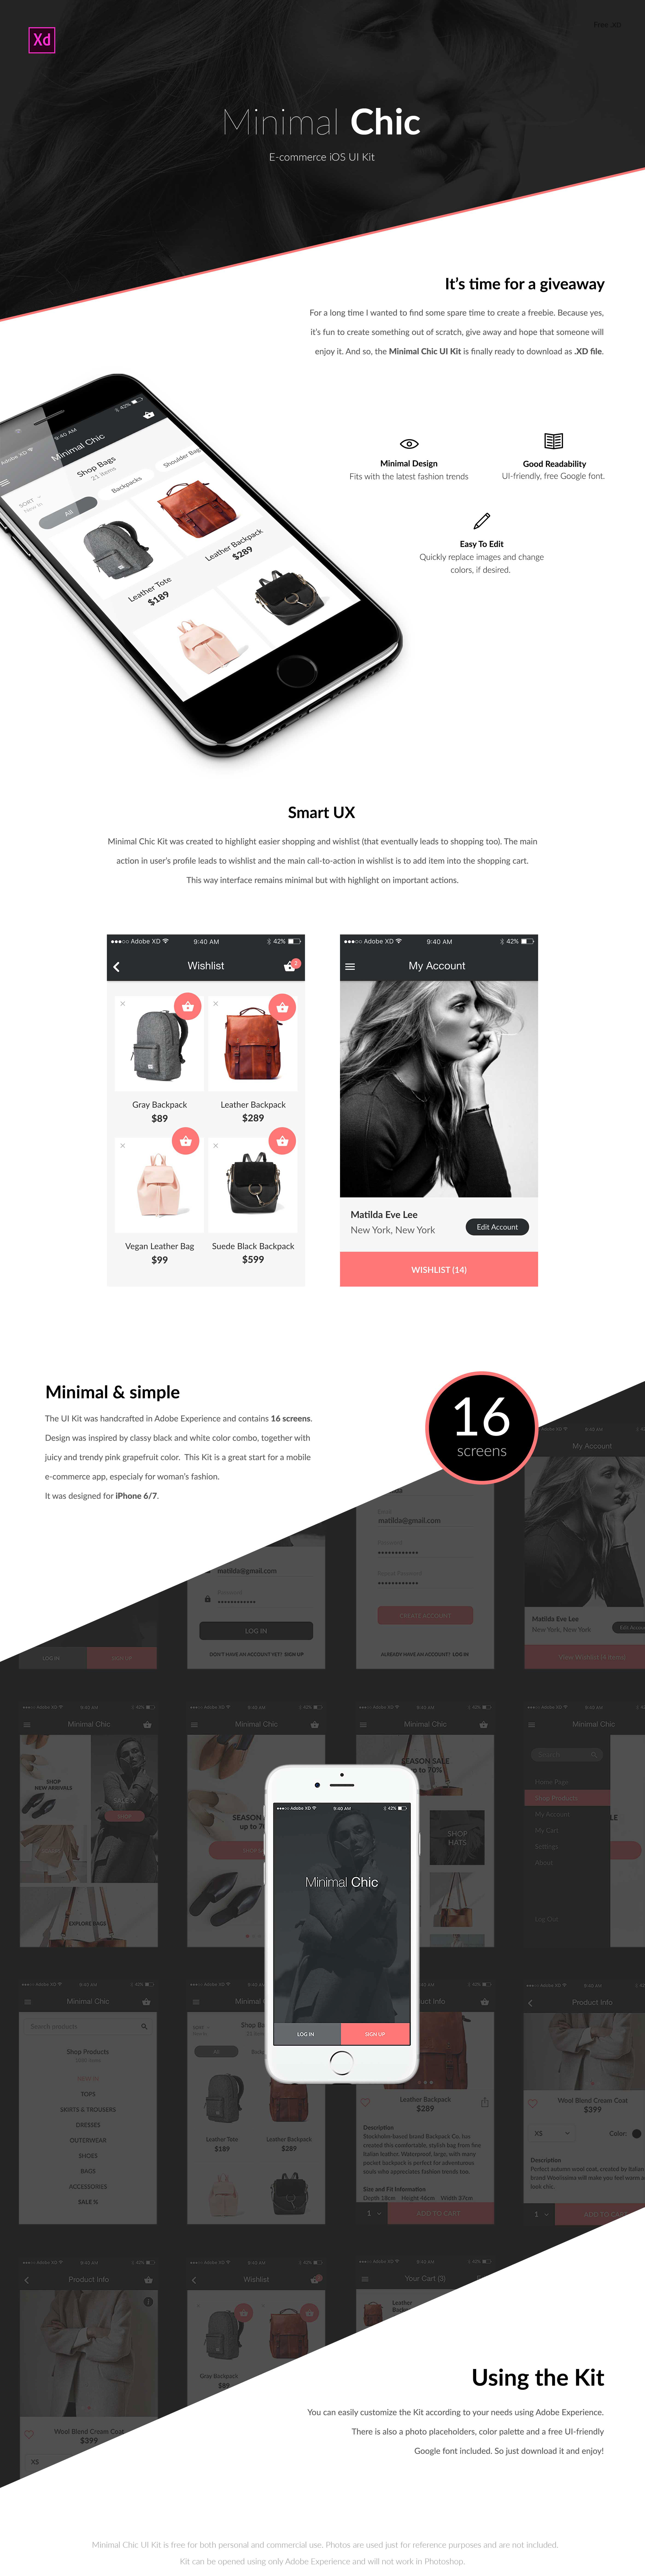 Minimal Chic - Free UI Kit from UIGarage